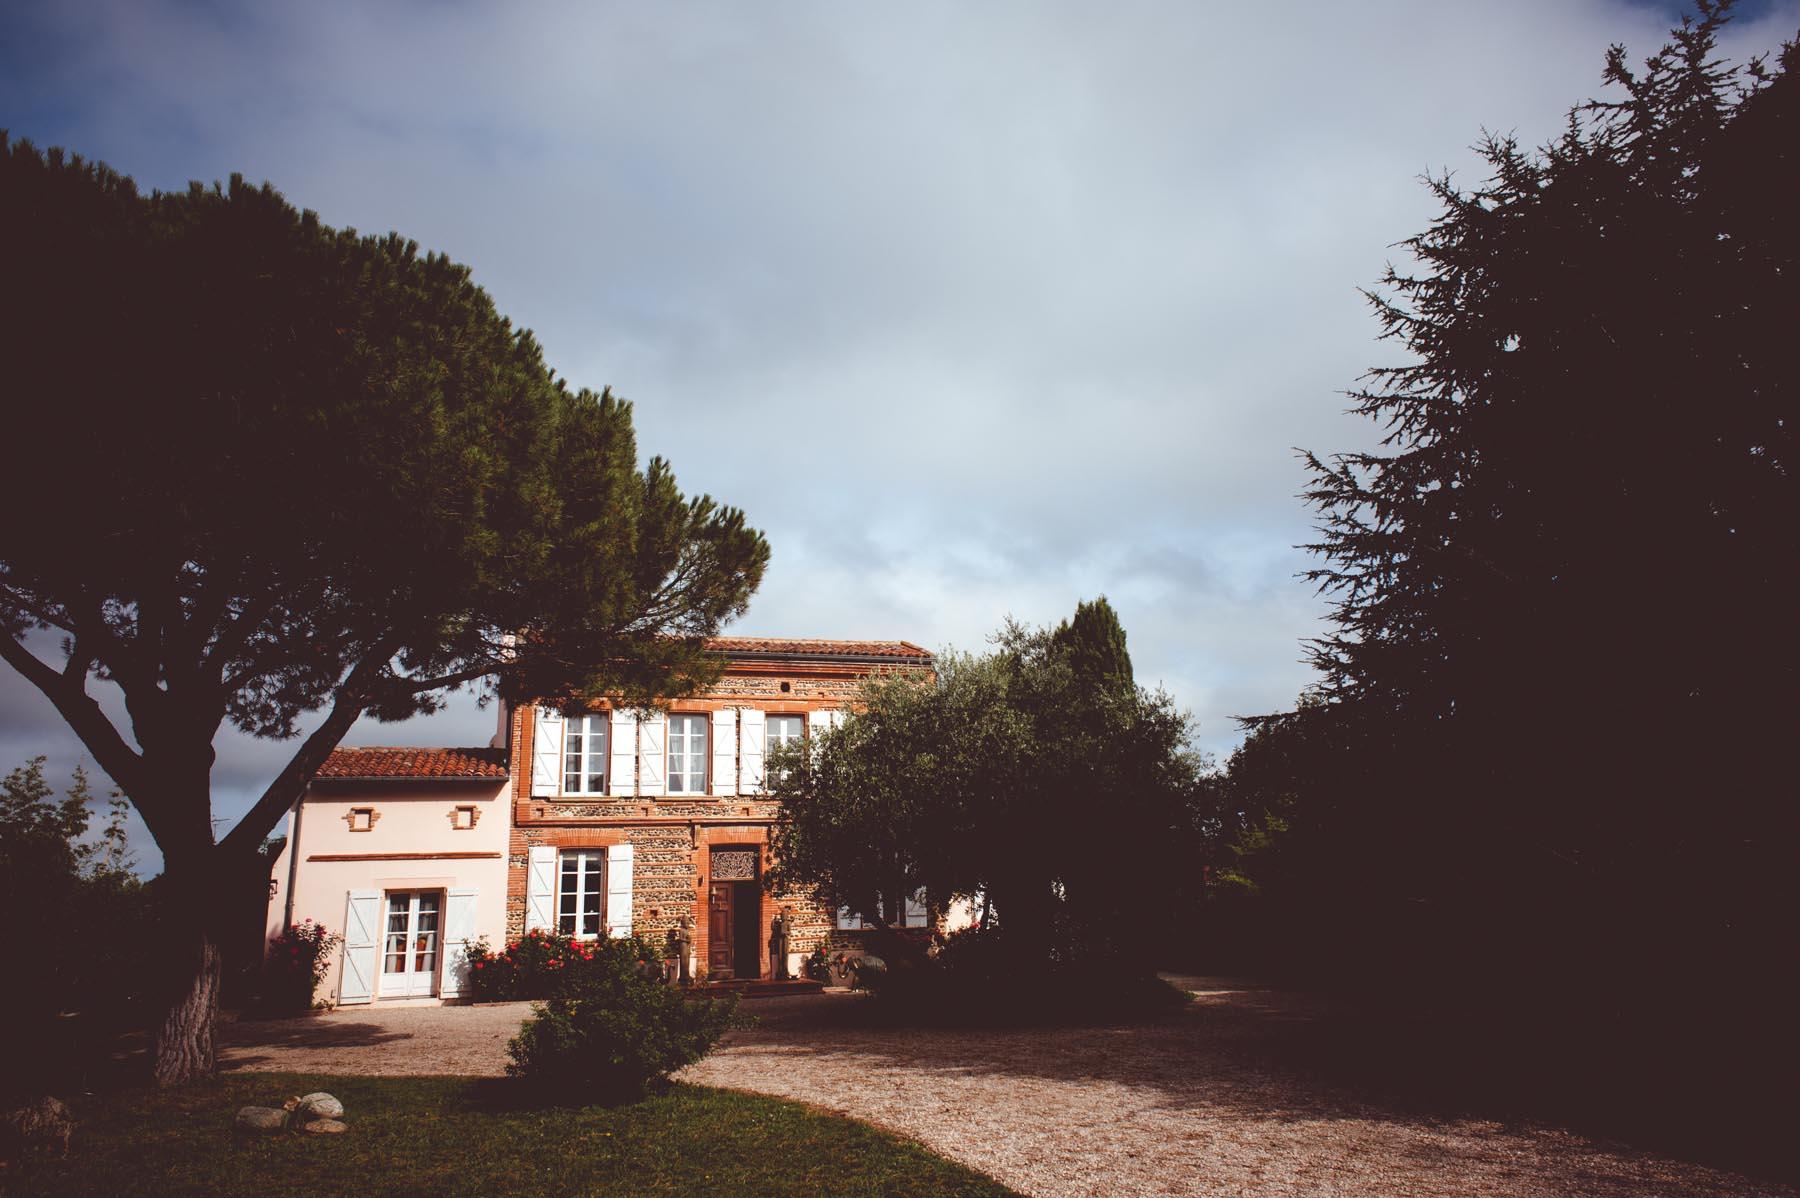 Photographe mariage original toulouse montpellier - M et S - Mademoiselle G Photographie (1)